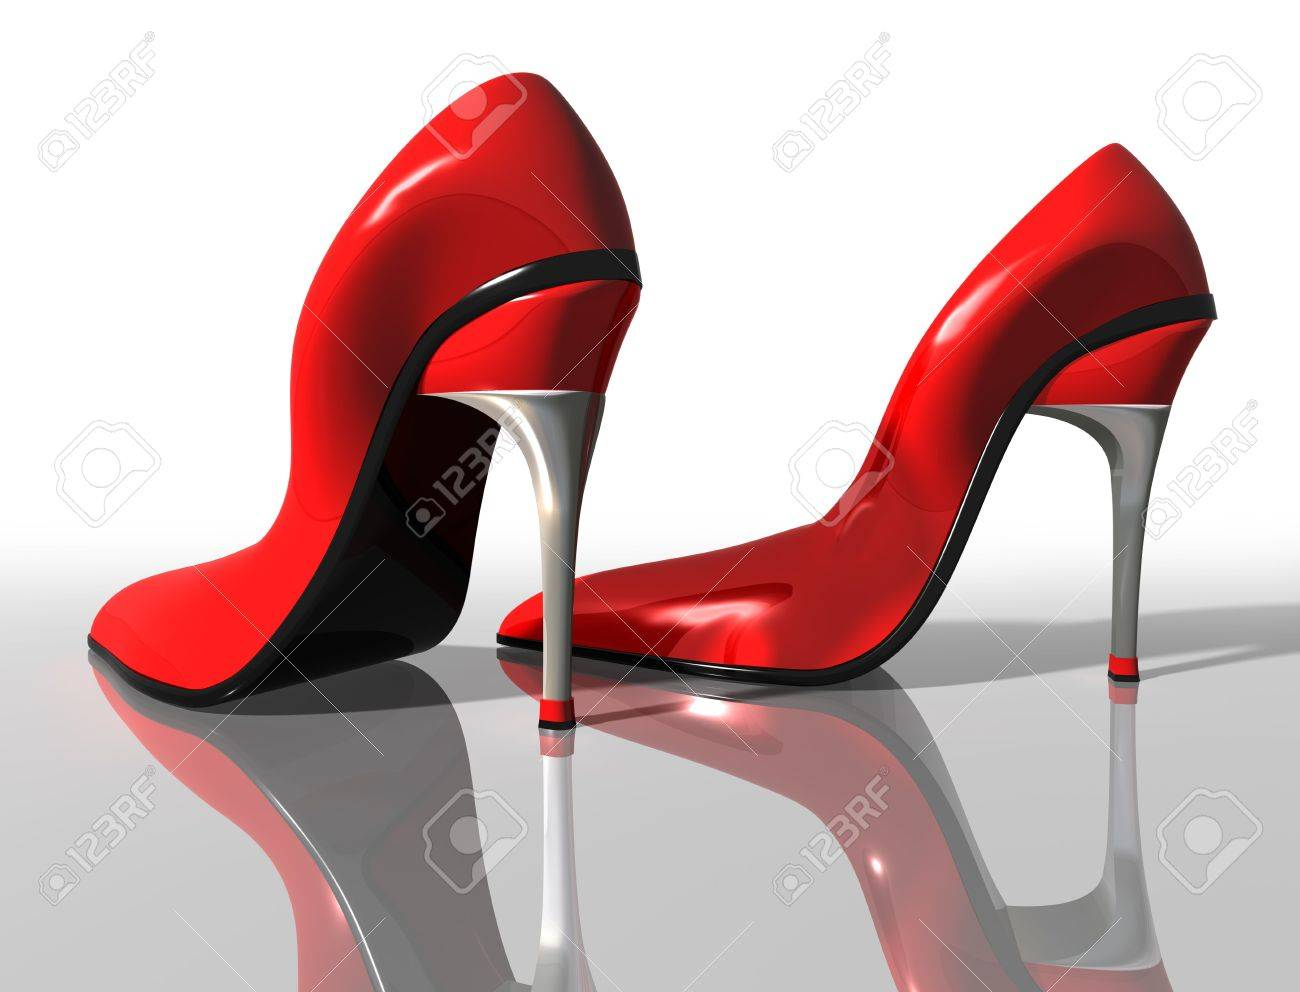 Red High Heel Wedges